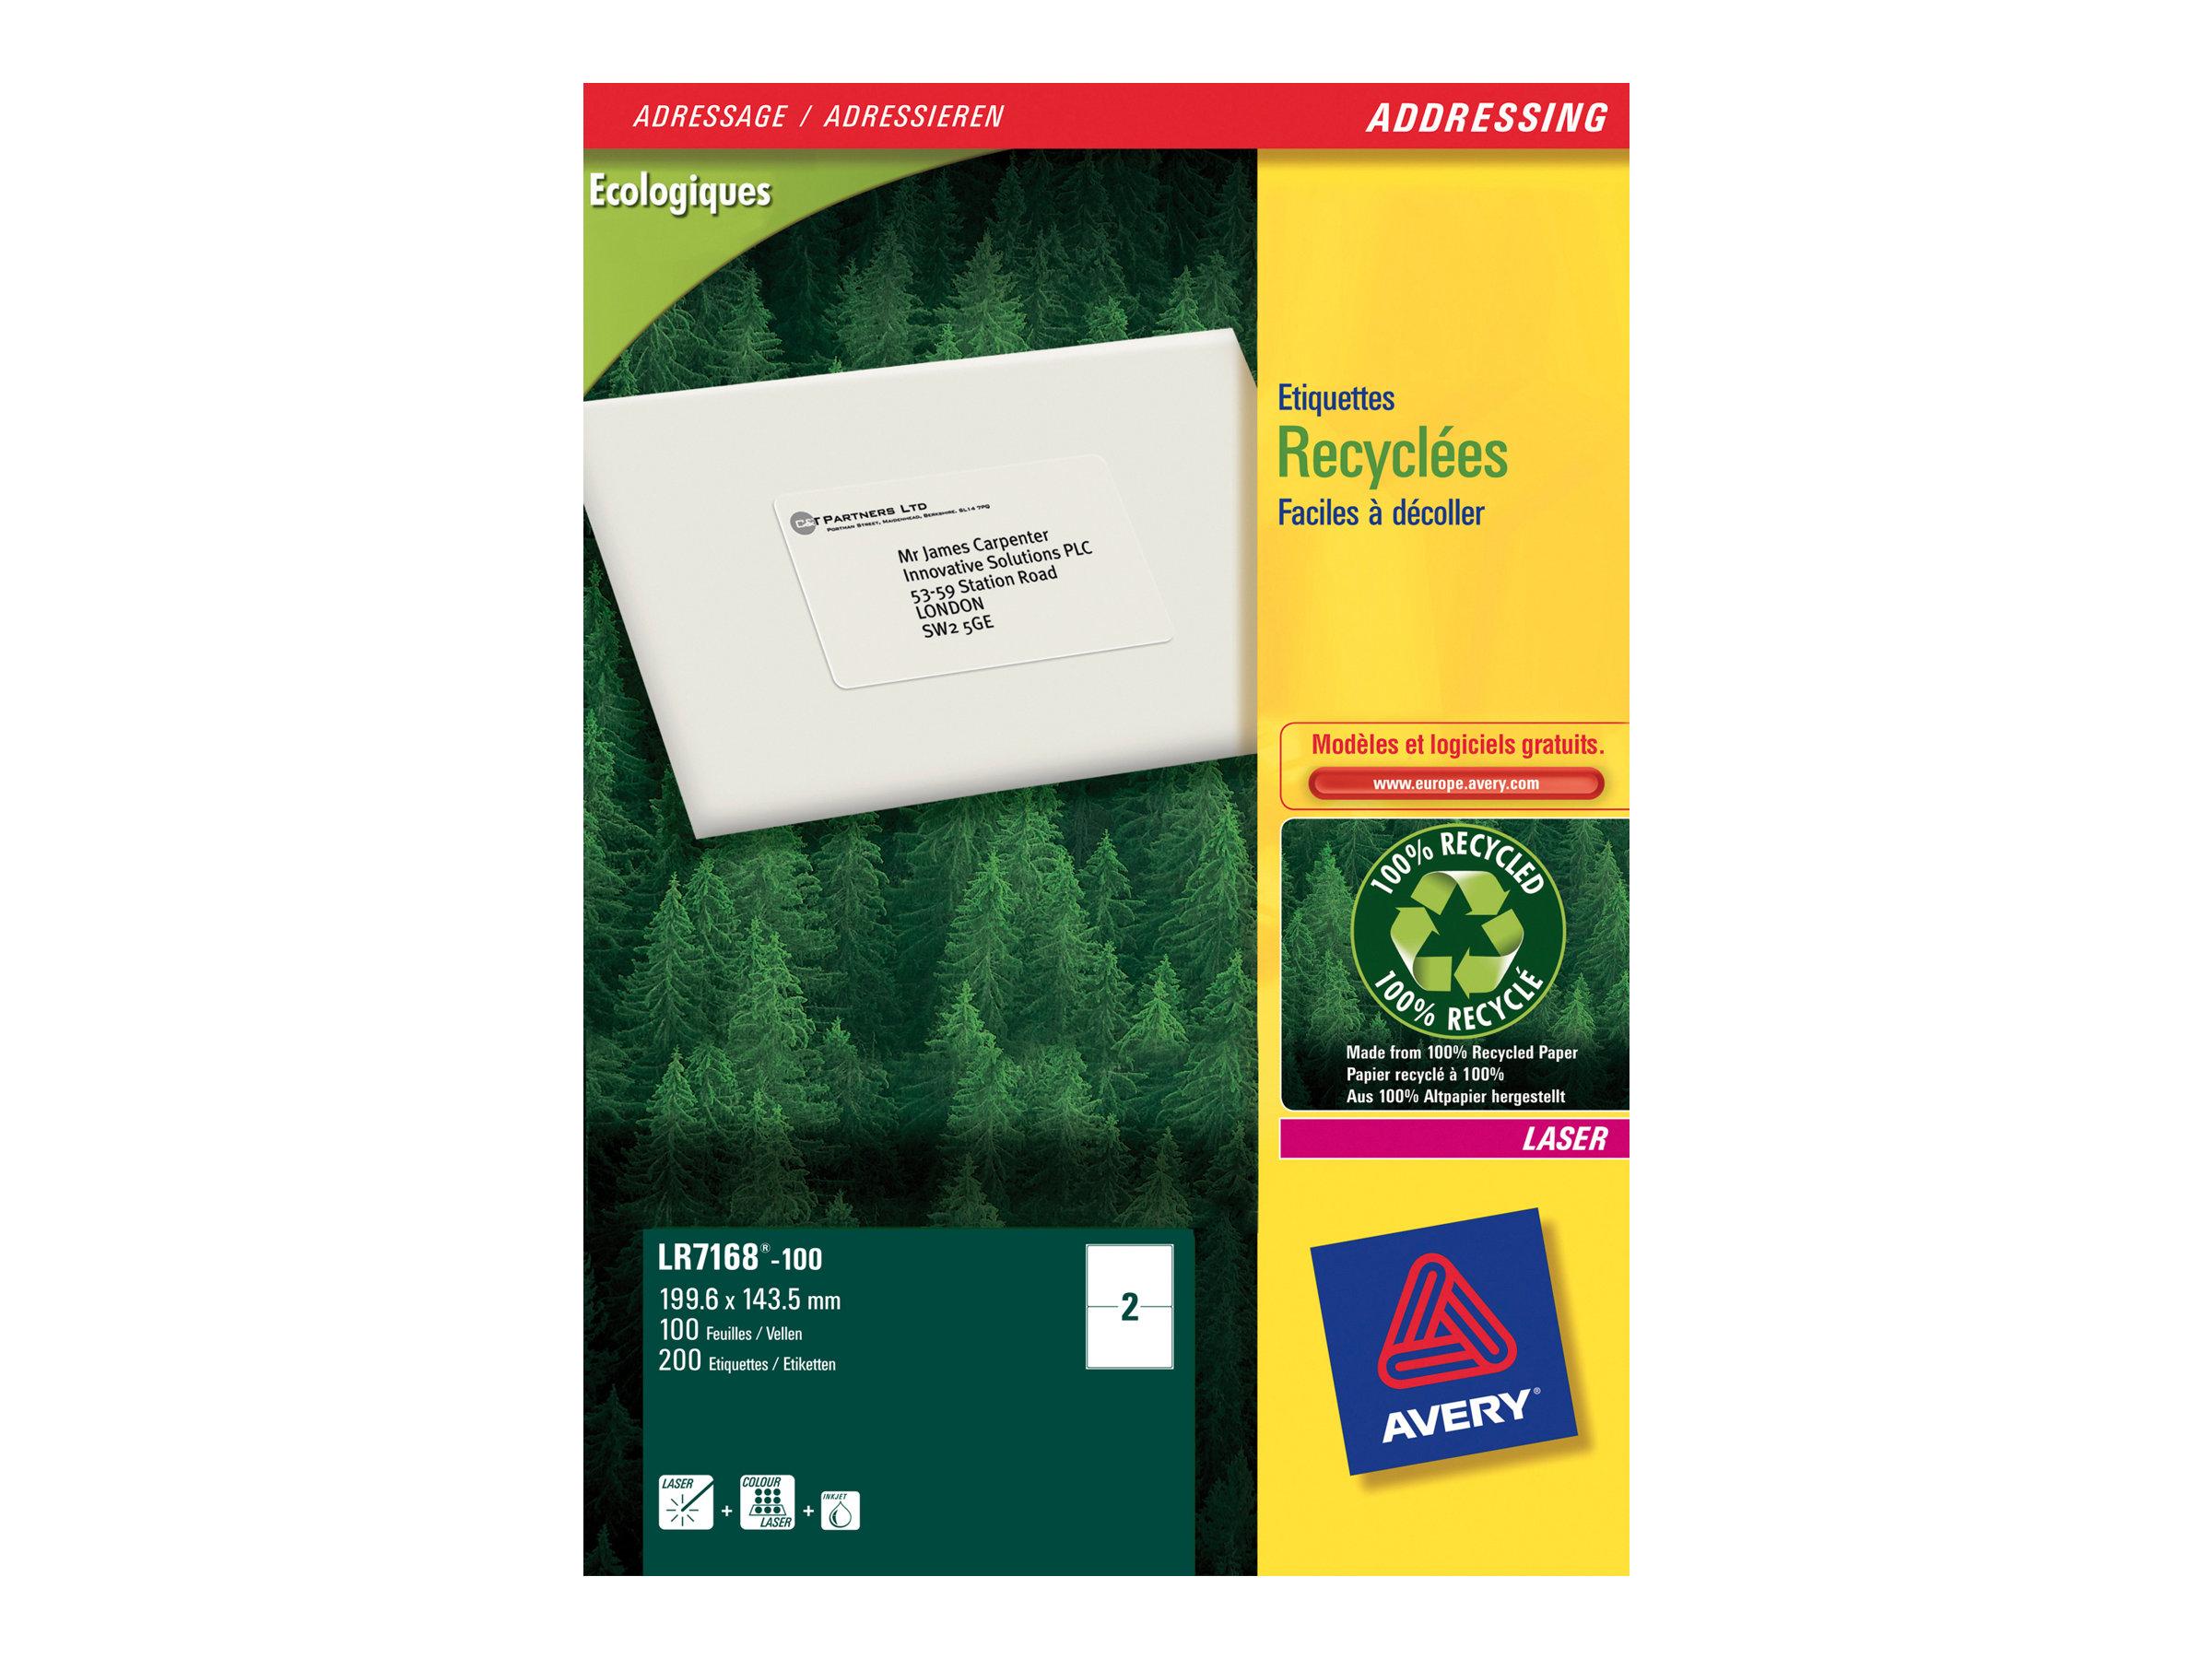 Avery - 200 Étiquettes adresse recyclées blanches - 143,5 x 199,6 mm - Impression laser - réf LR7168-100